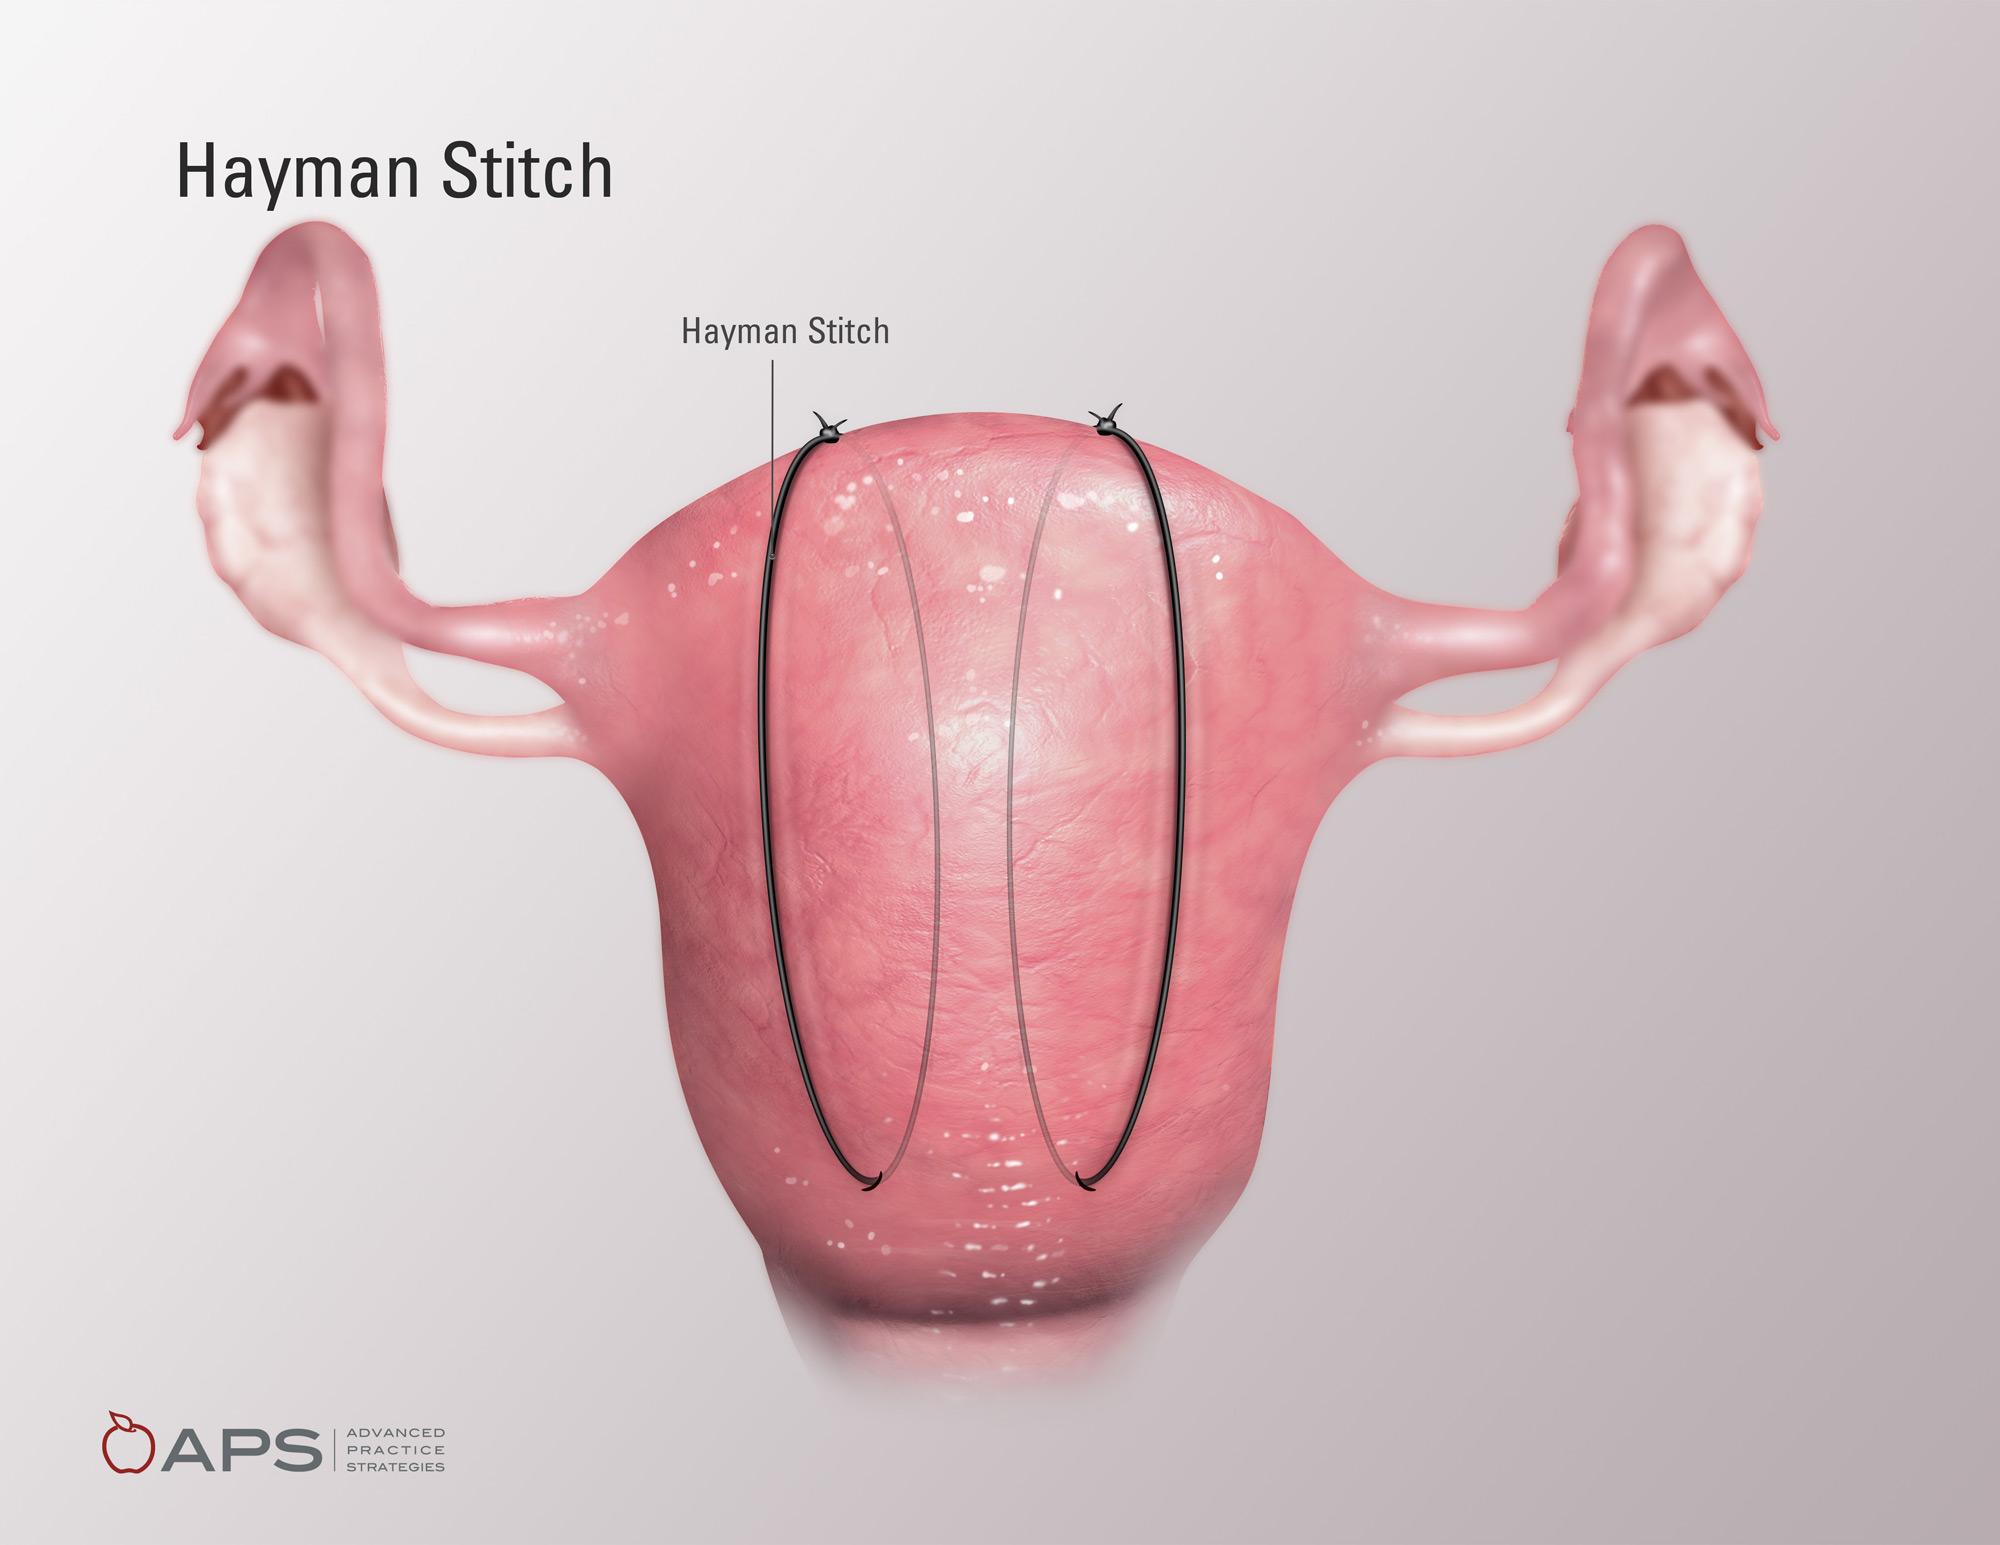 Hayman Stitch